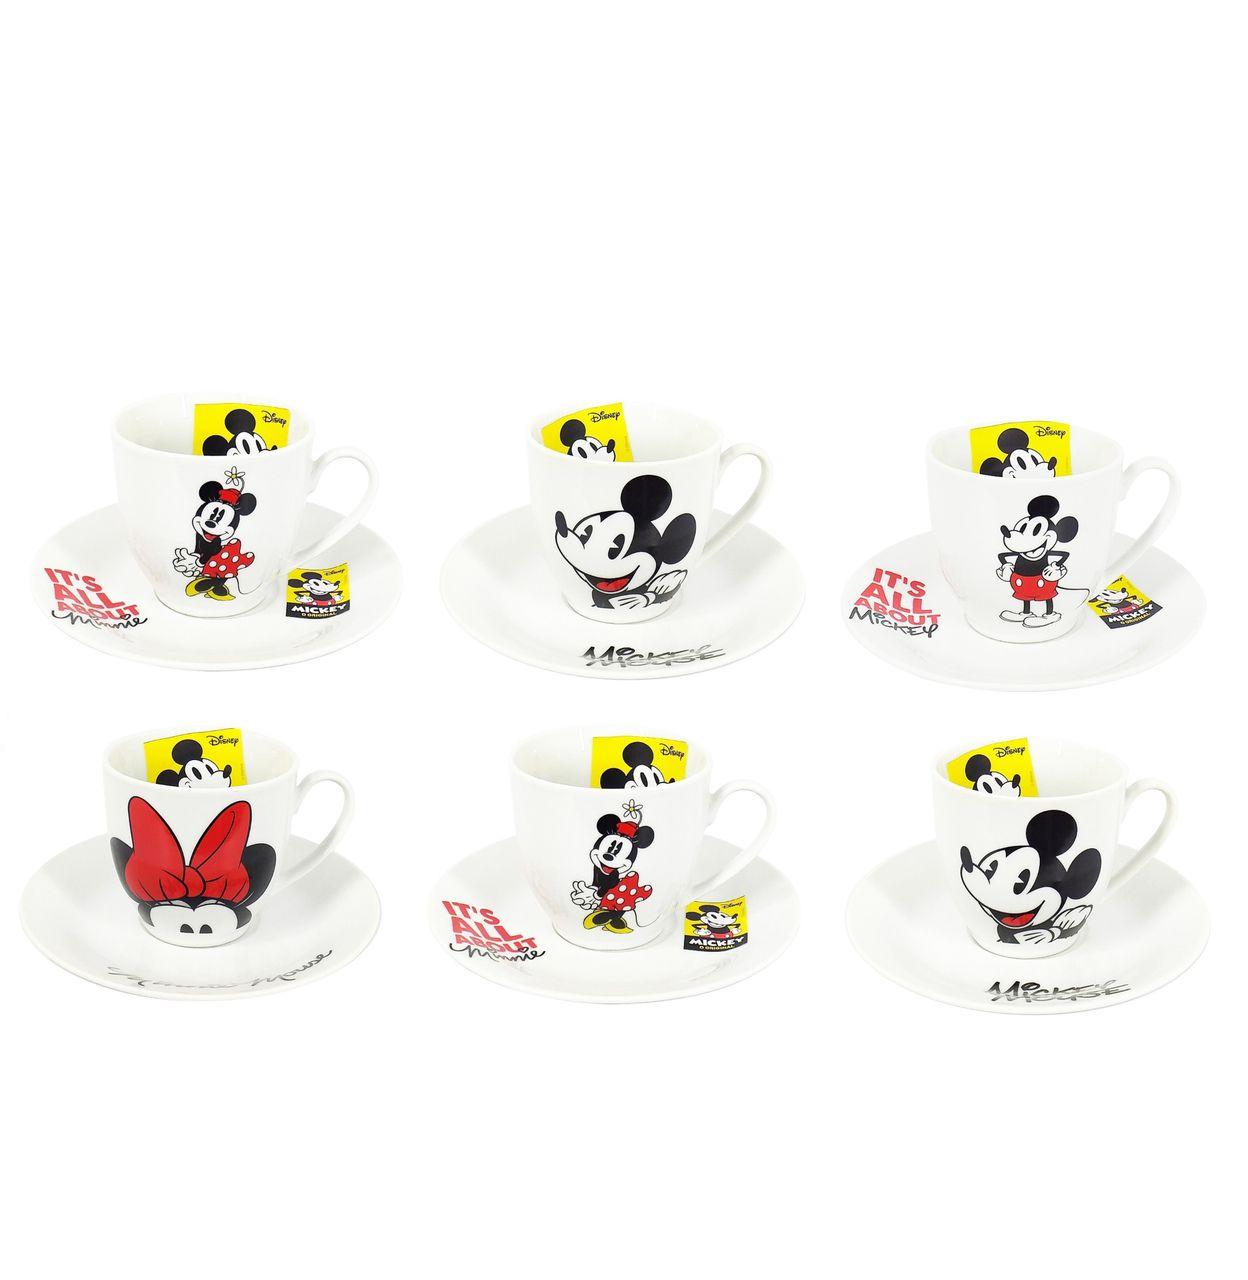 Conjunto de 6 Xícaras de Café Mickey Mouse & Minnie Mouse: Disney